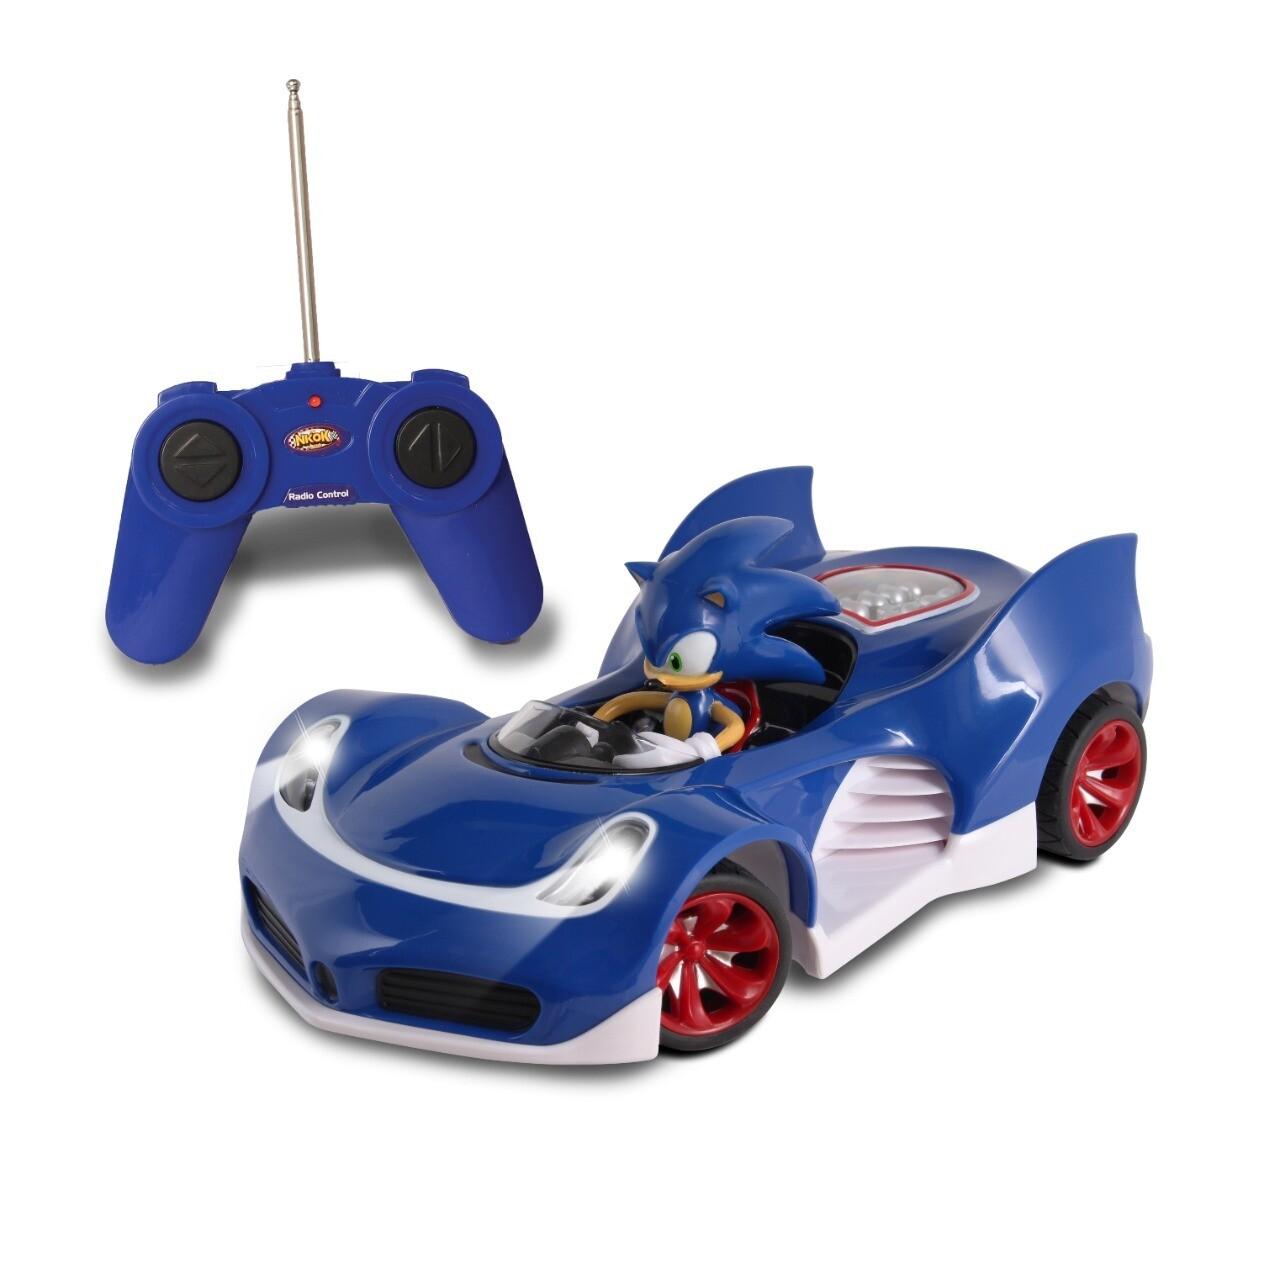 Full Funtion R/c Sonic Car